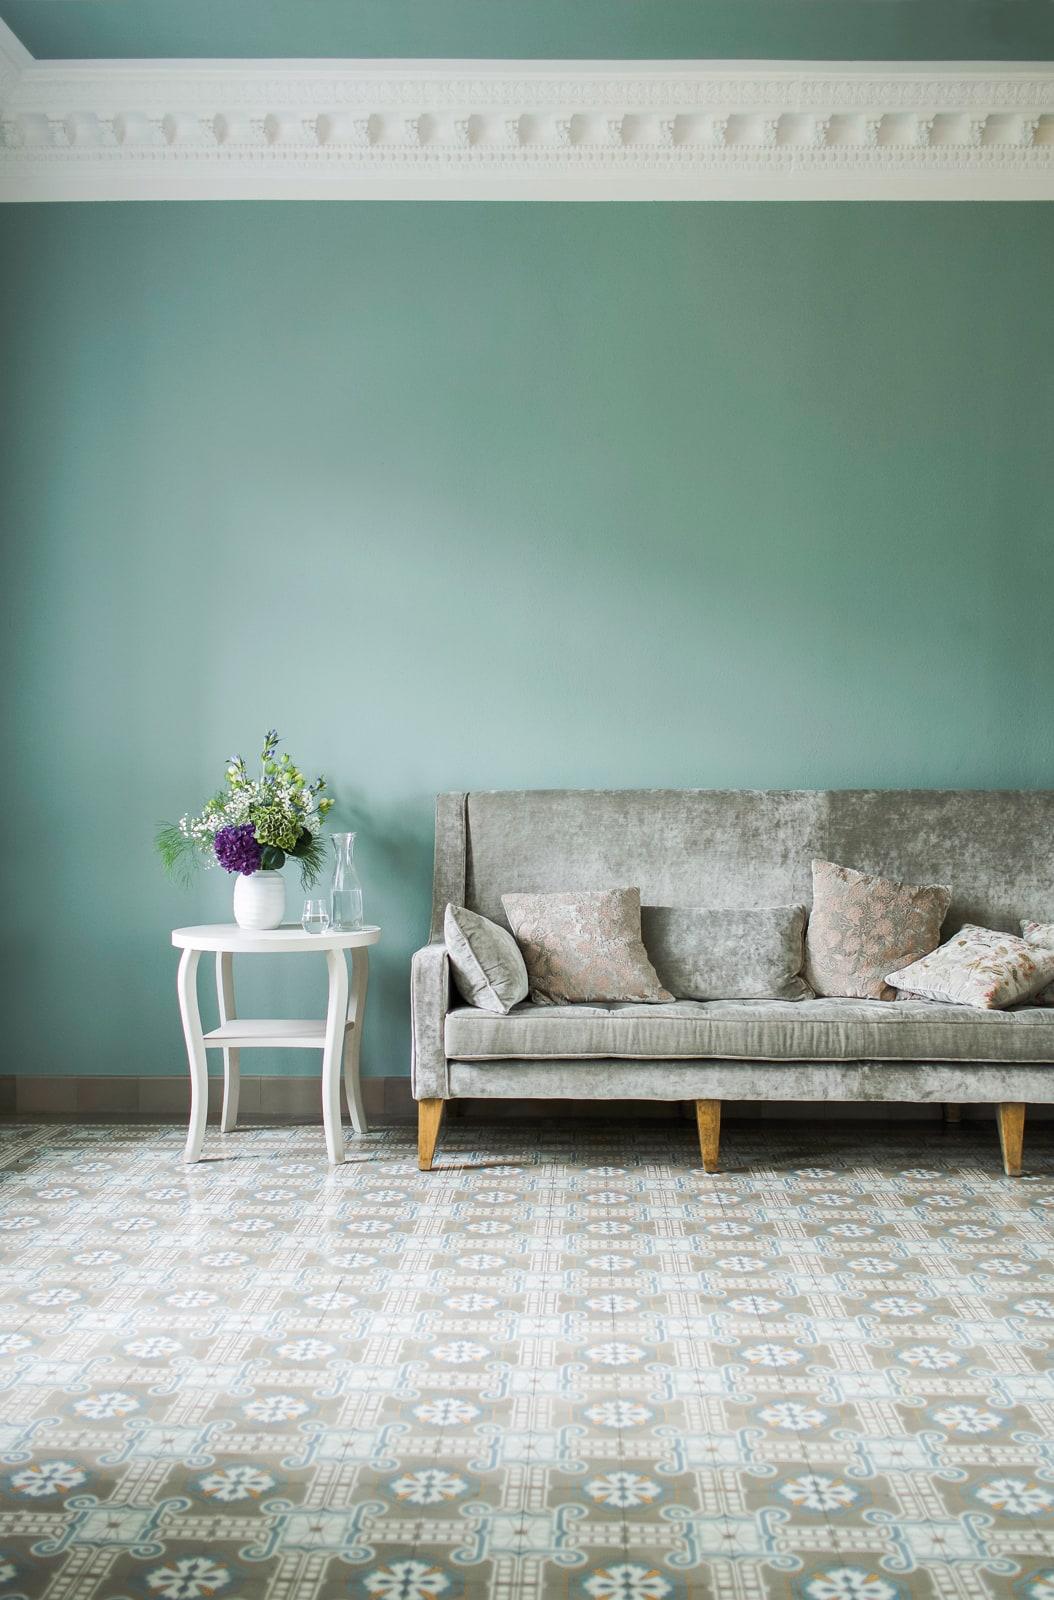 zementfliesen-terrazzofliesen-kreidefarbe-blauer-salon-terrazzo-fugenlos-viaplatten | Kreidefarbe Blauer Salon 60 ml